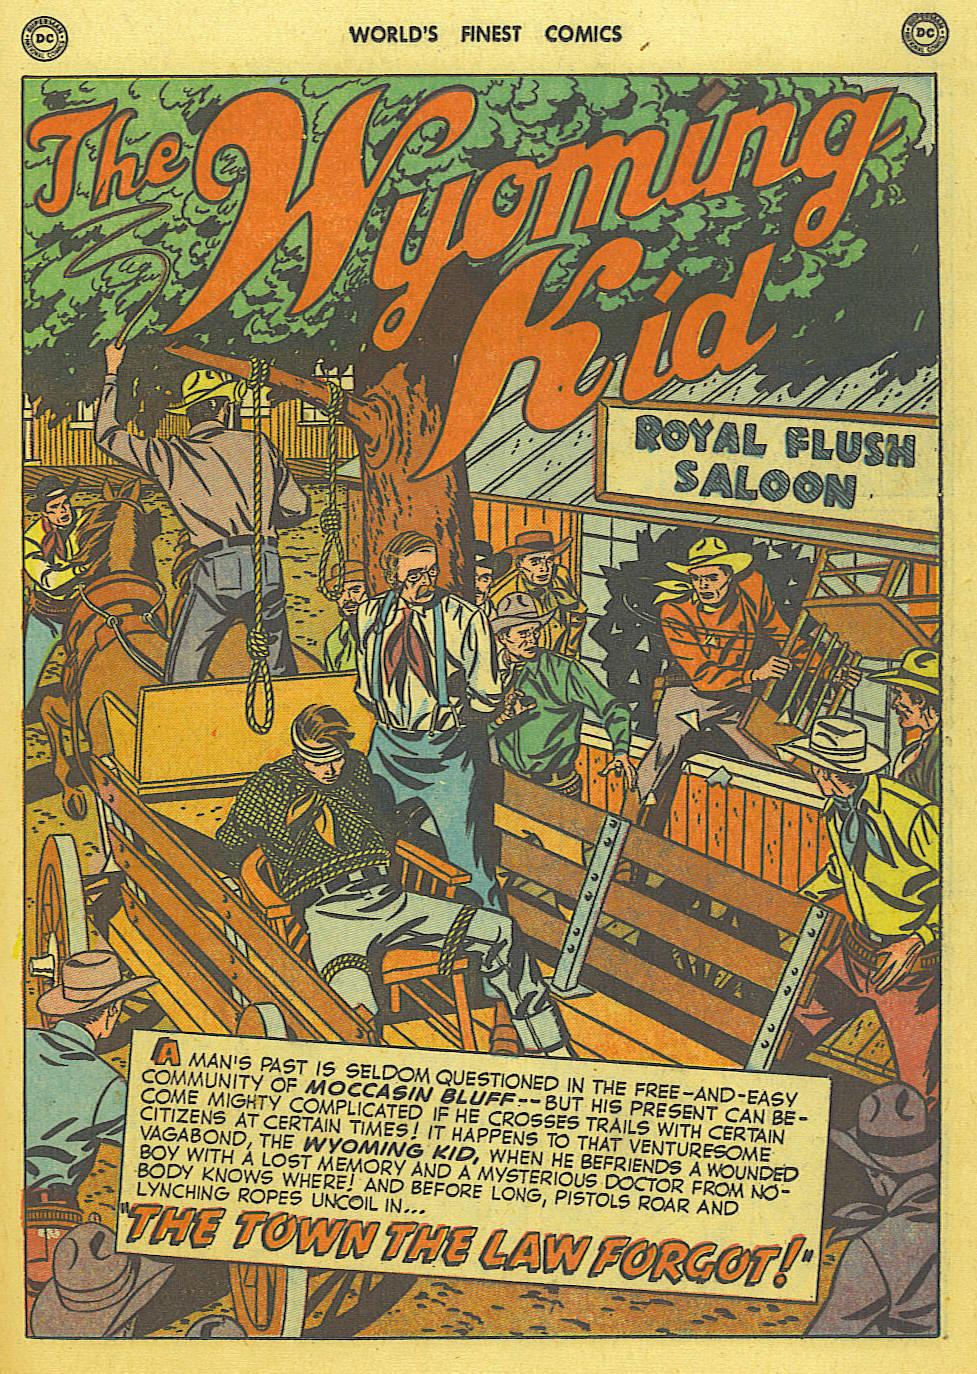 Read online World's Finest Comics comic -  Issue #49 - 40